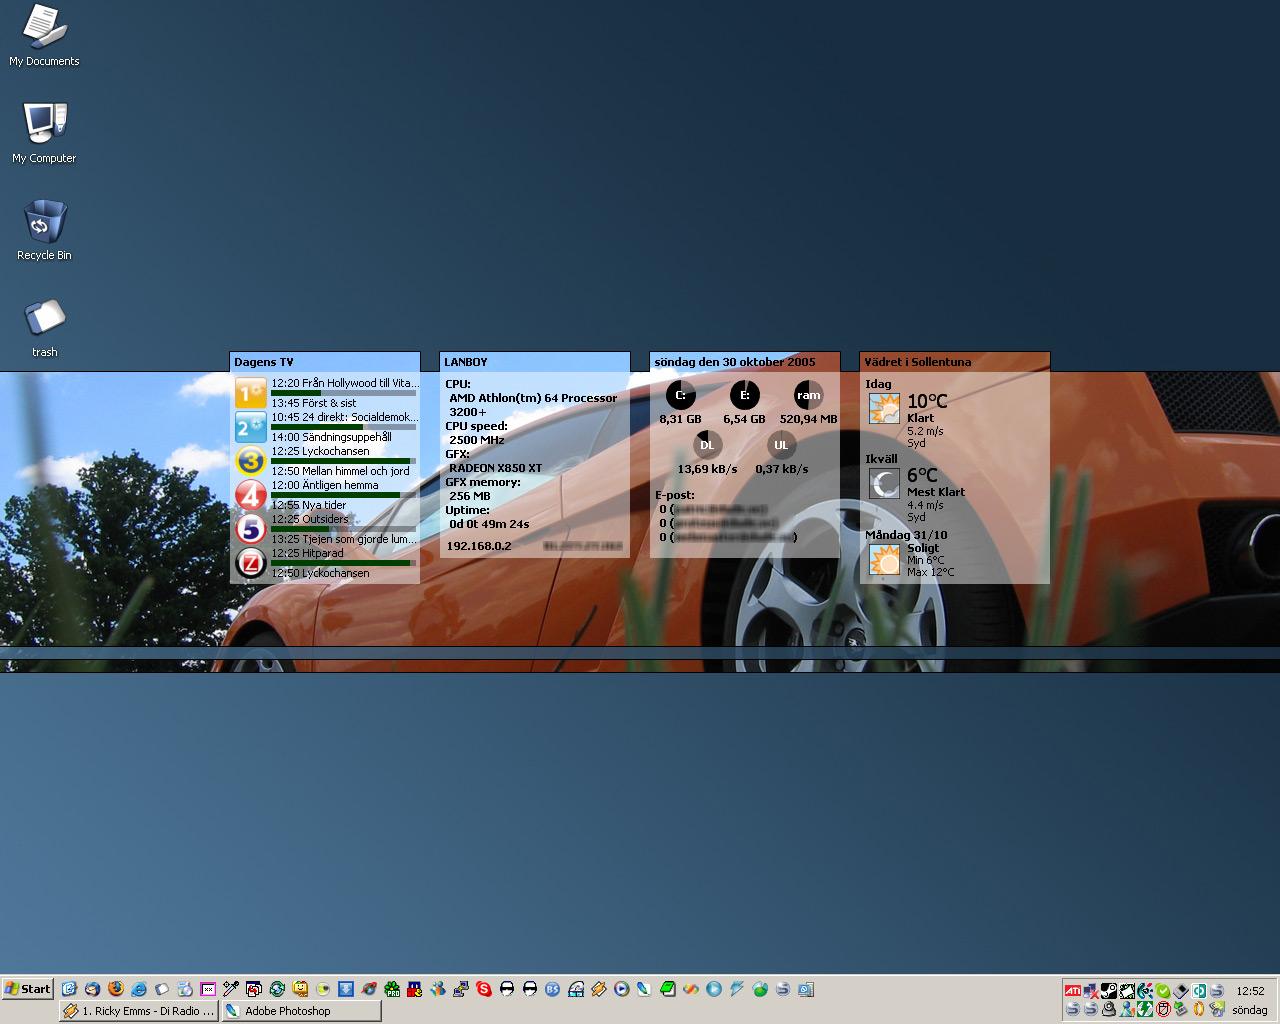 Title: Desktop (2005-10-30)